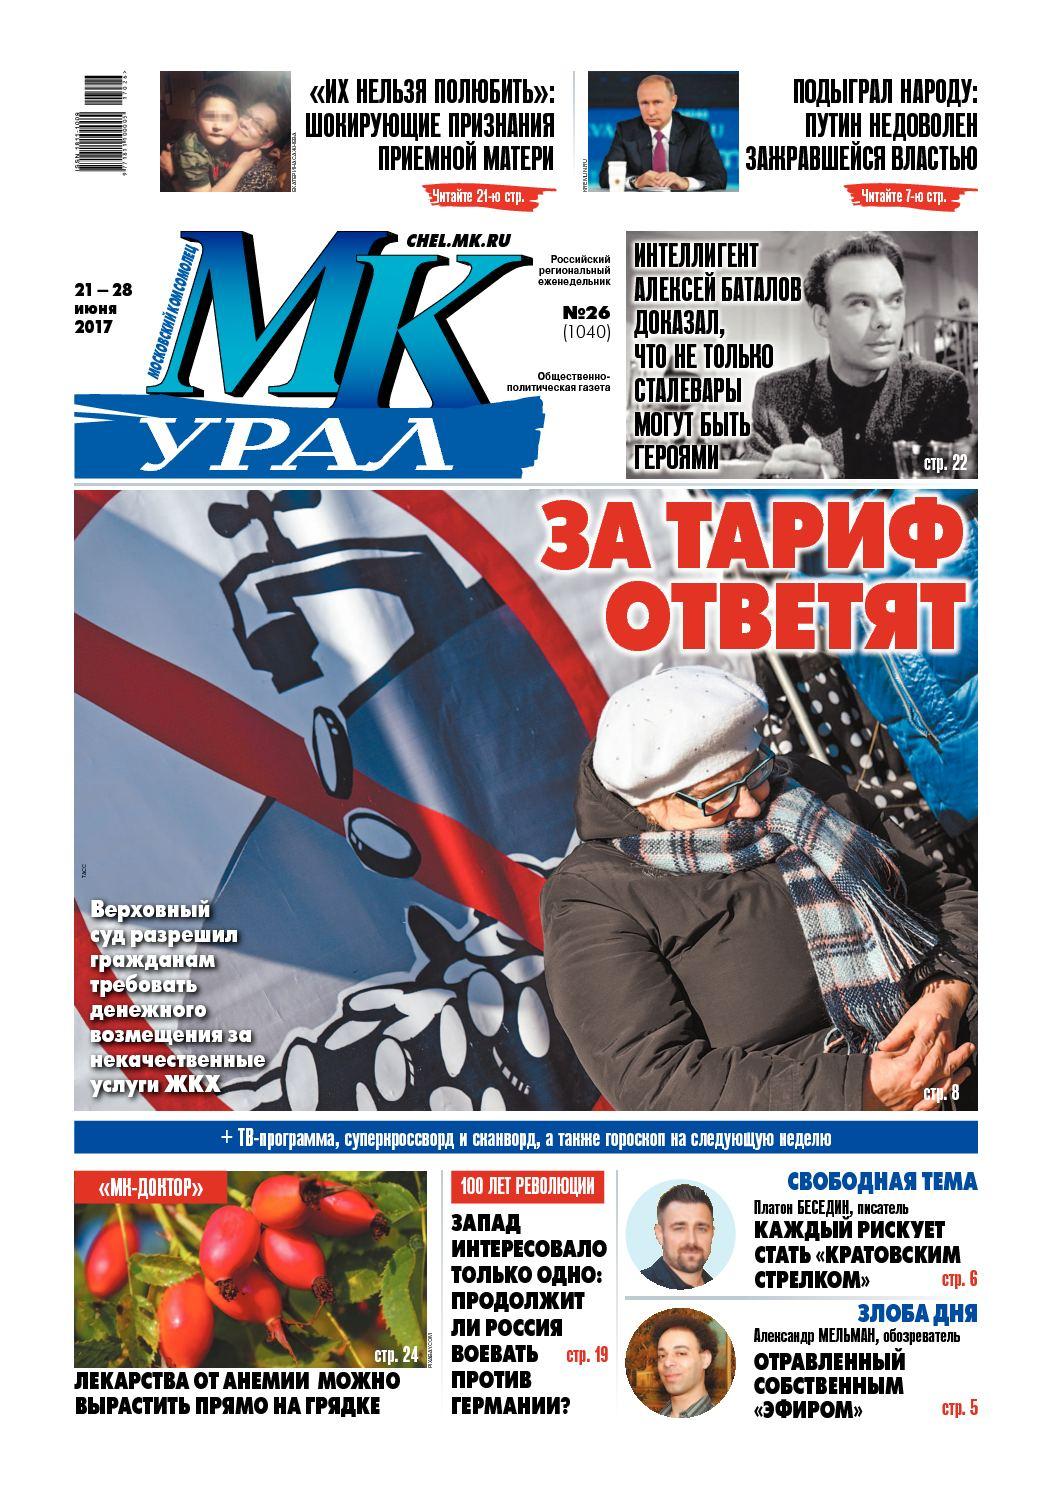 Комсомольская правда 07. 12. 2018 by ва-банкъ issuu.